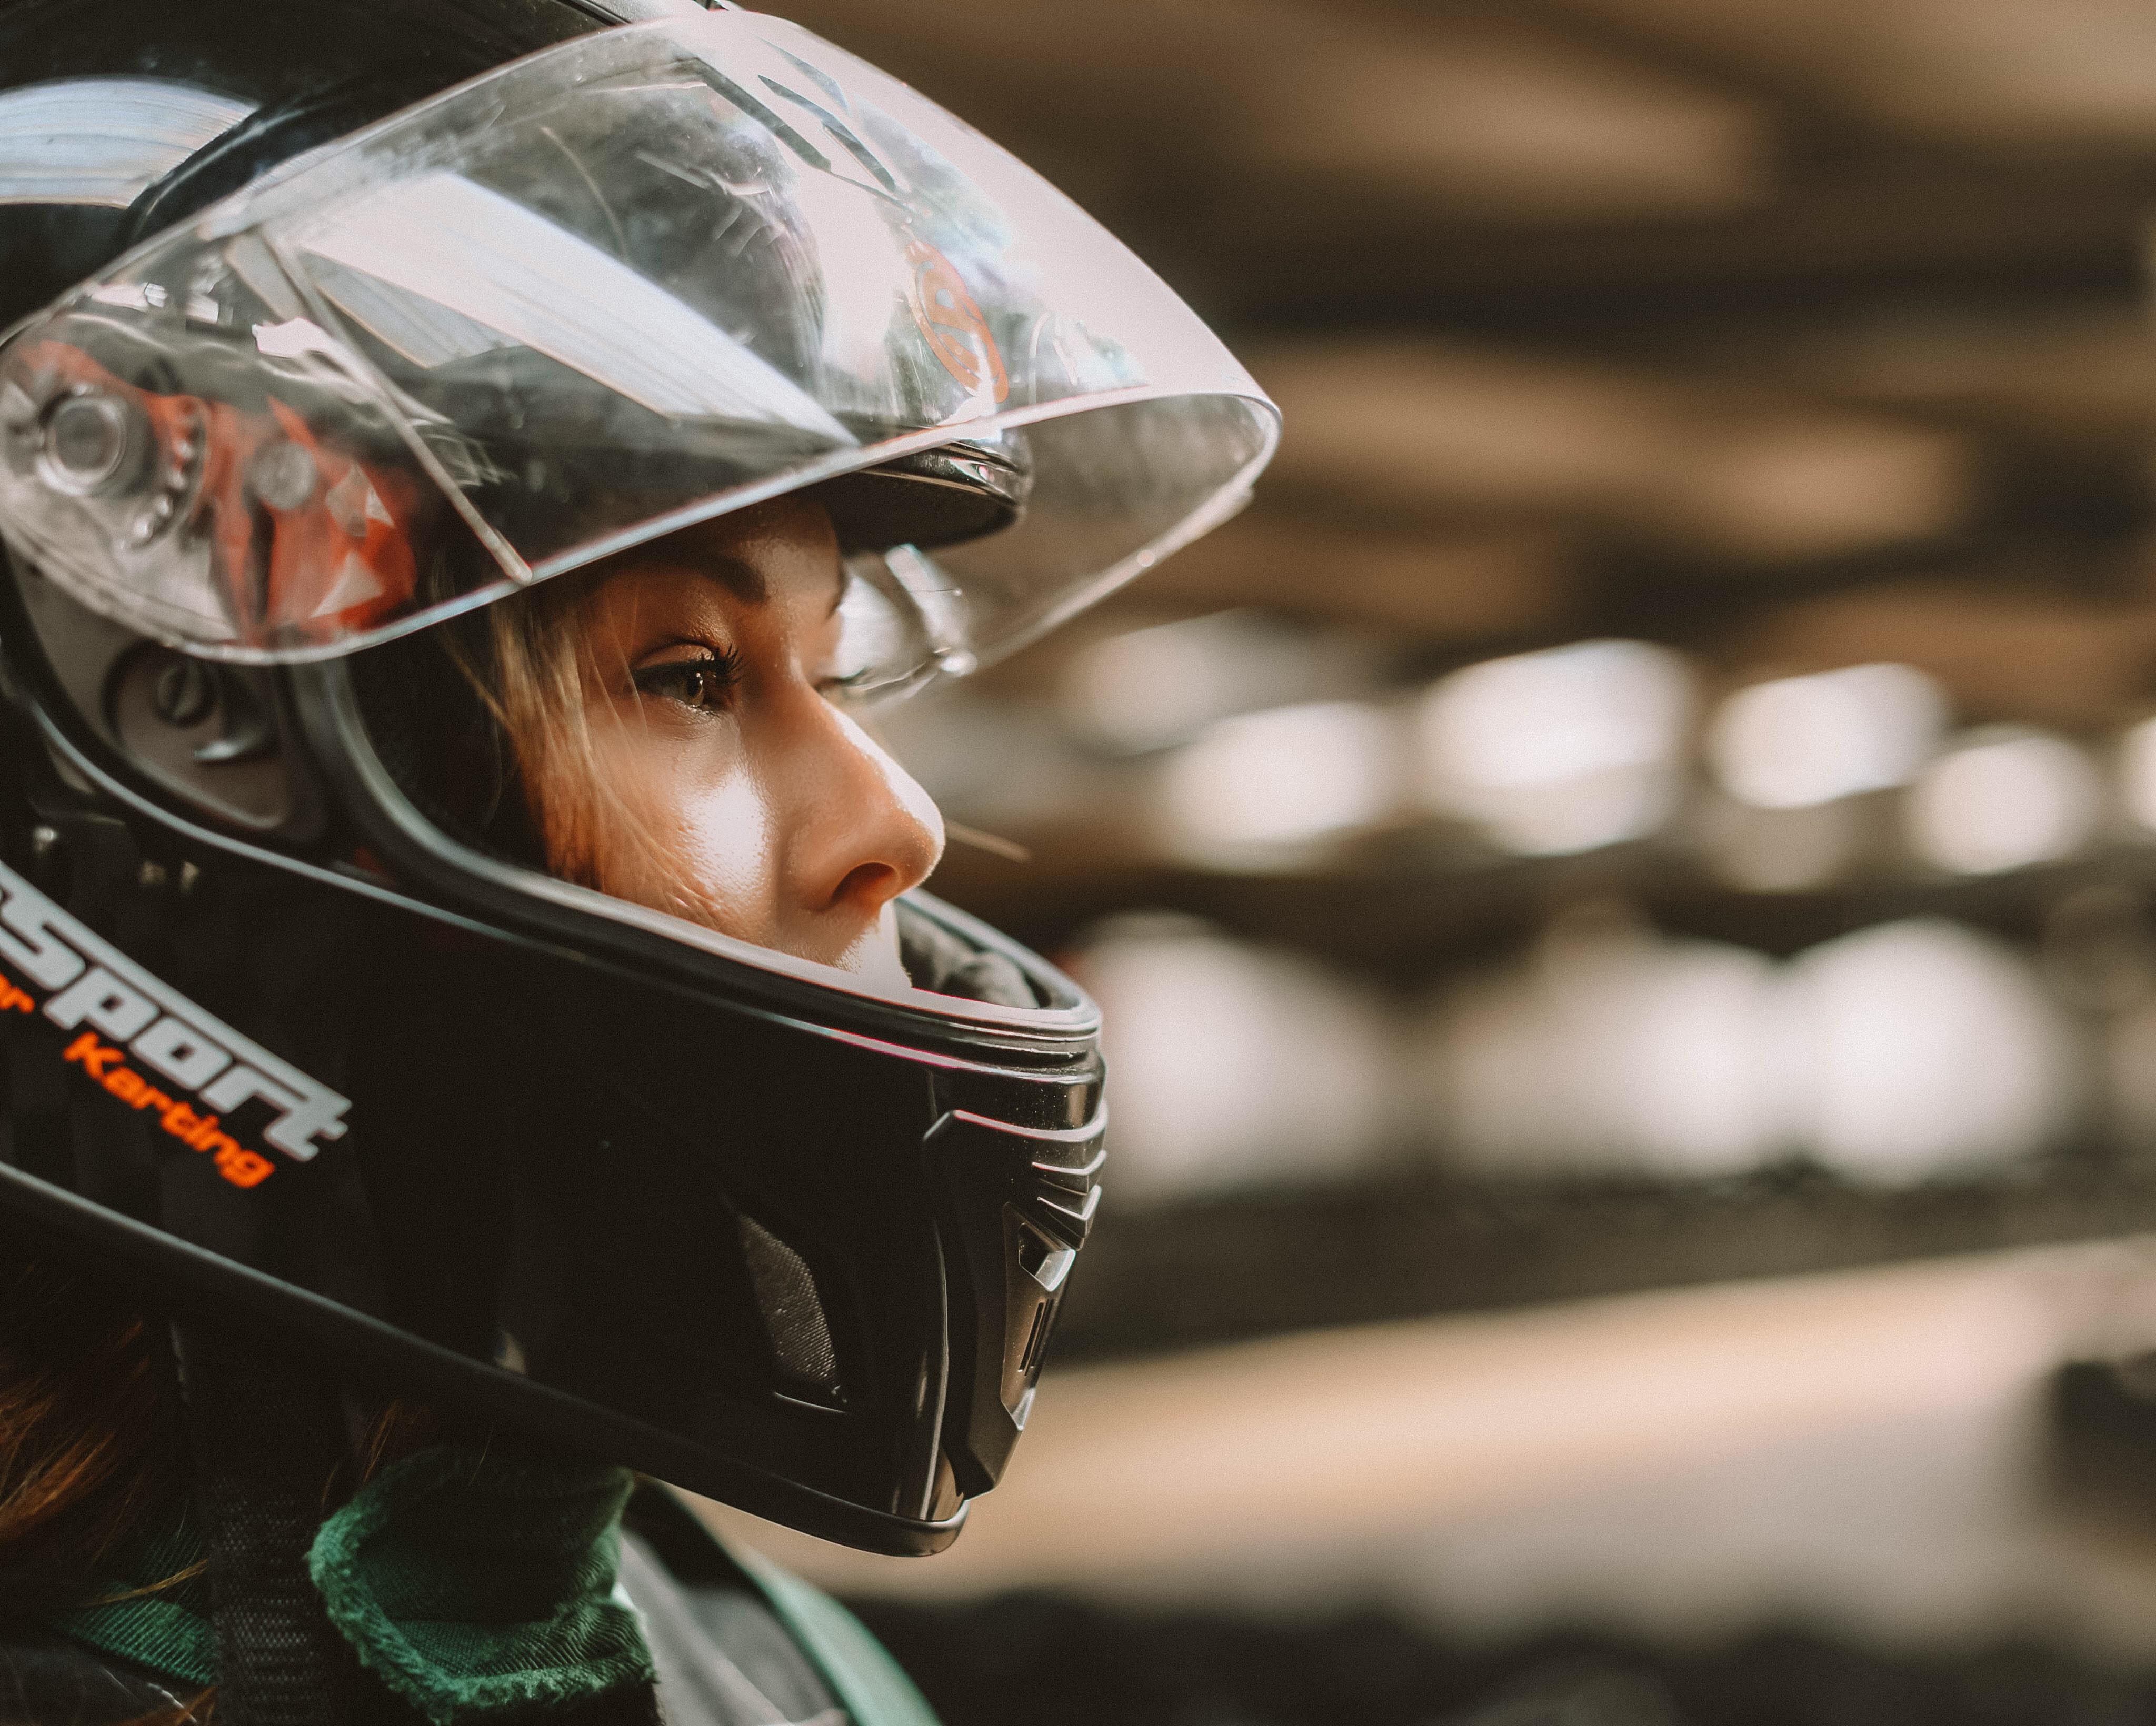 Activity Superstore karting experience via Debenhams